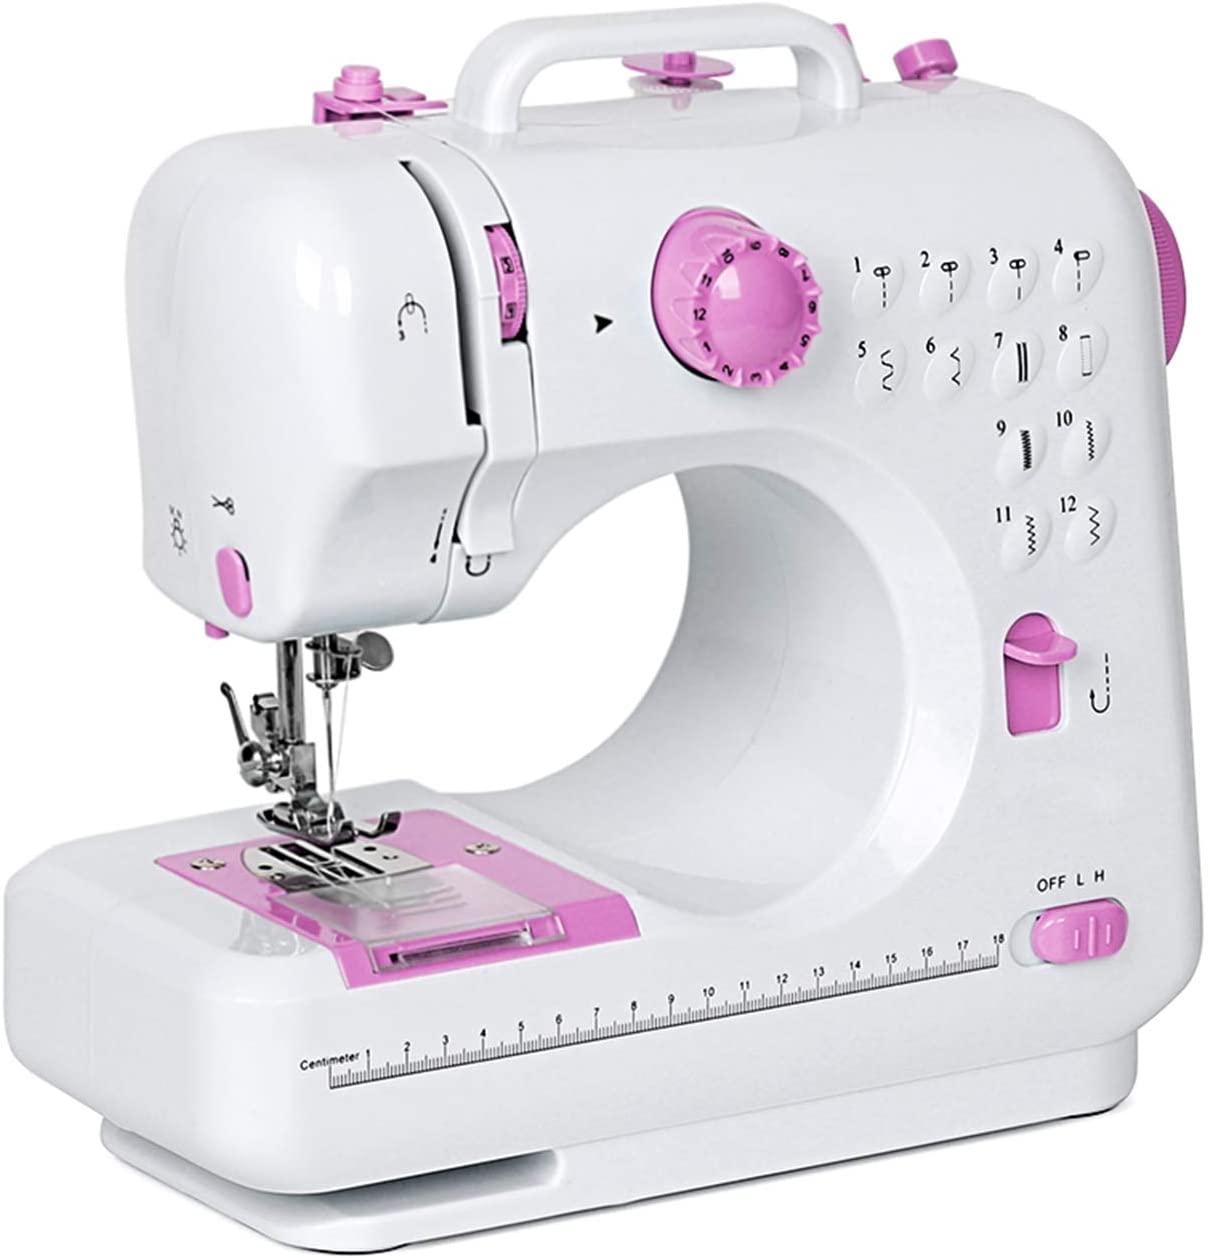 A white sewing machine